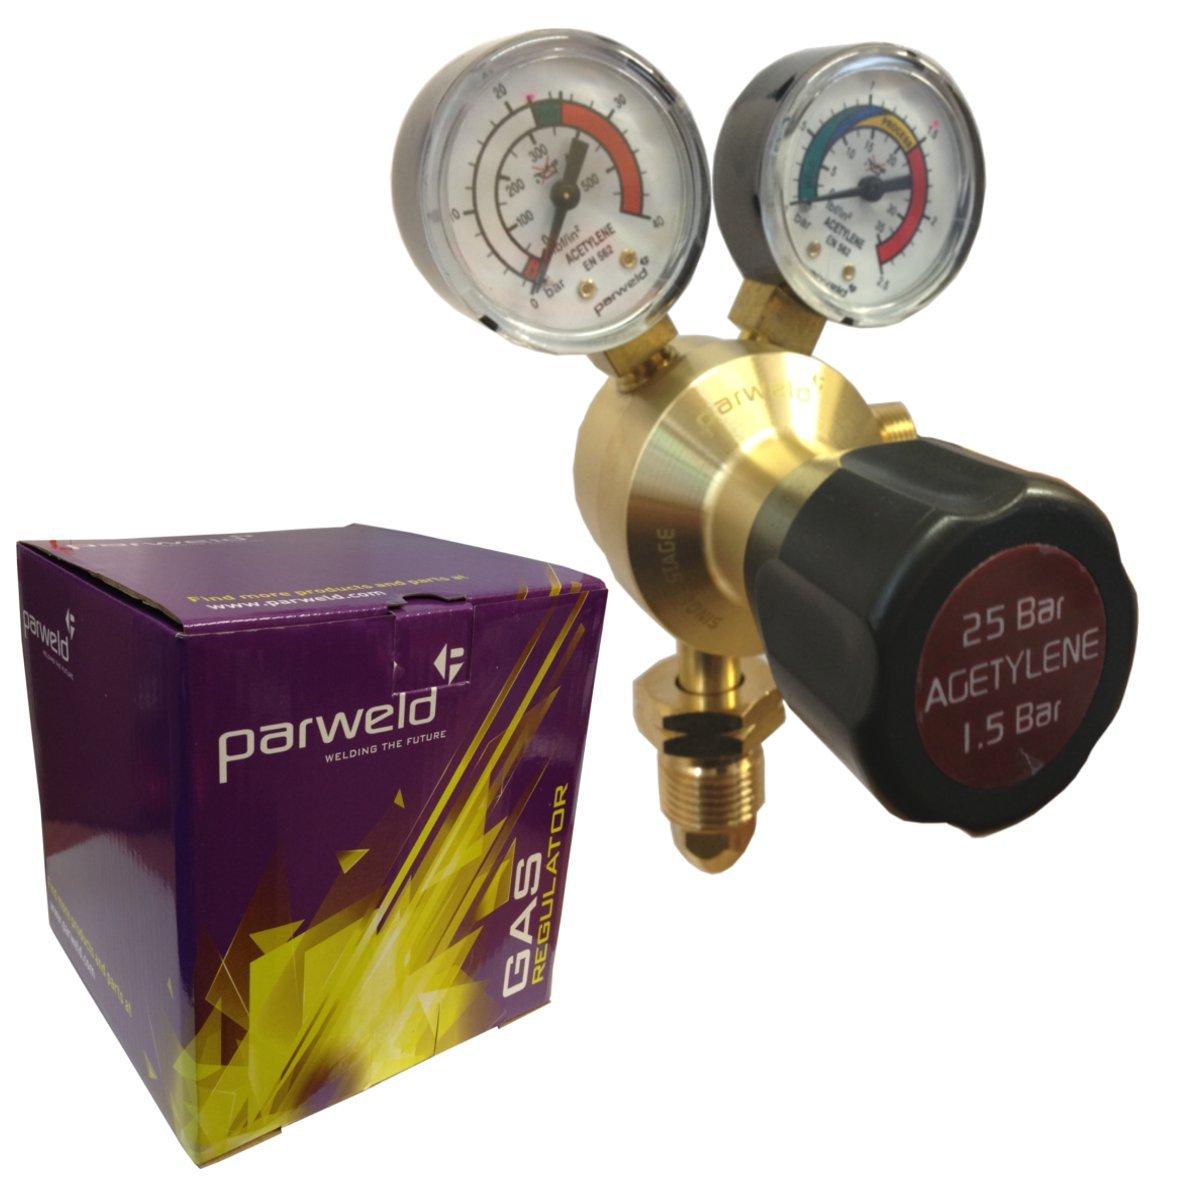 Parweld Acetylene single stage regulator twin gauge - Gas cutting welding regulator